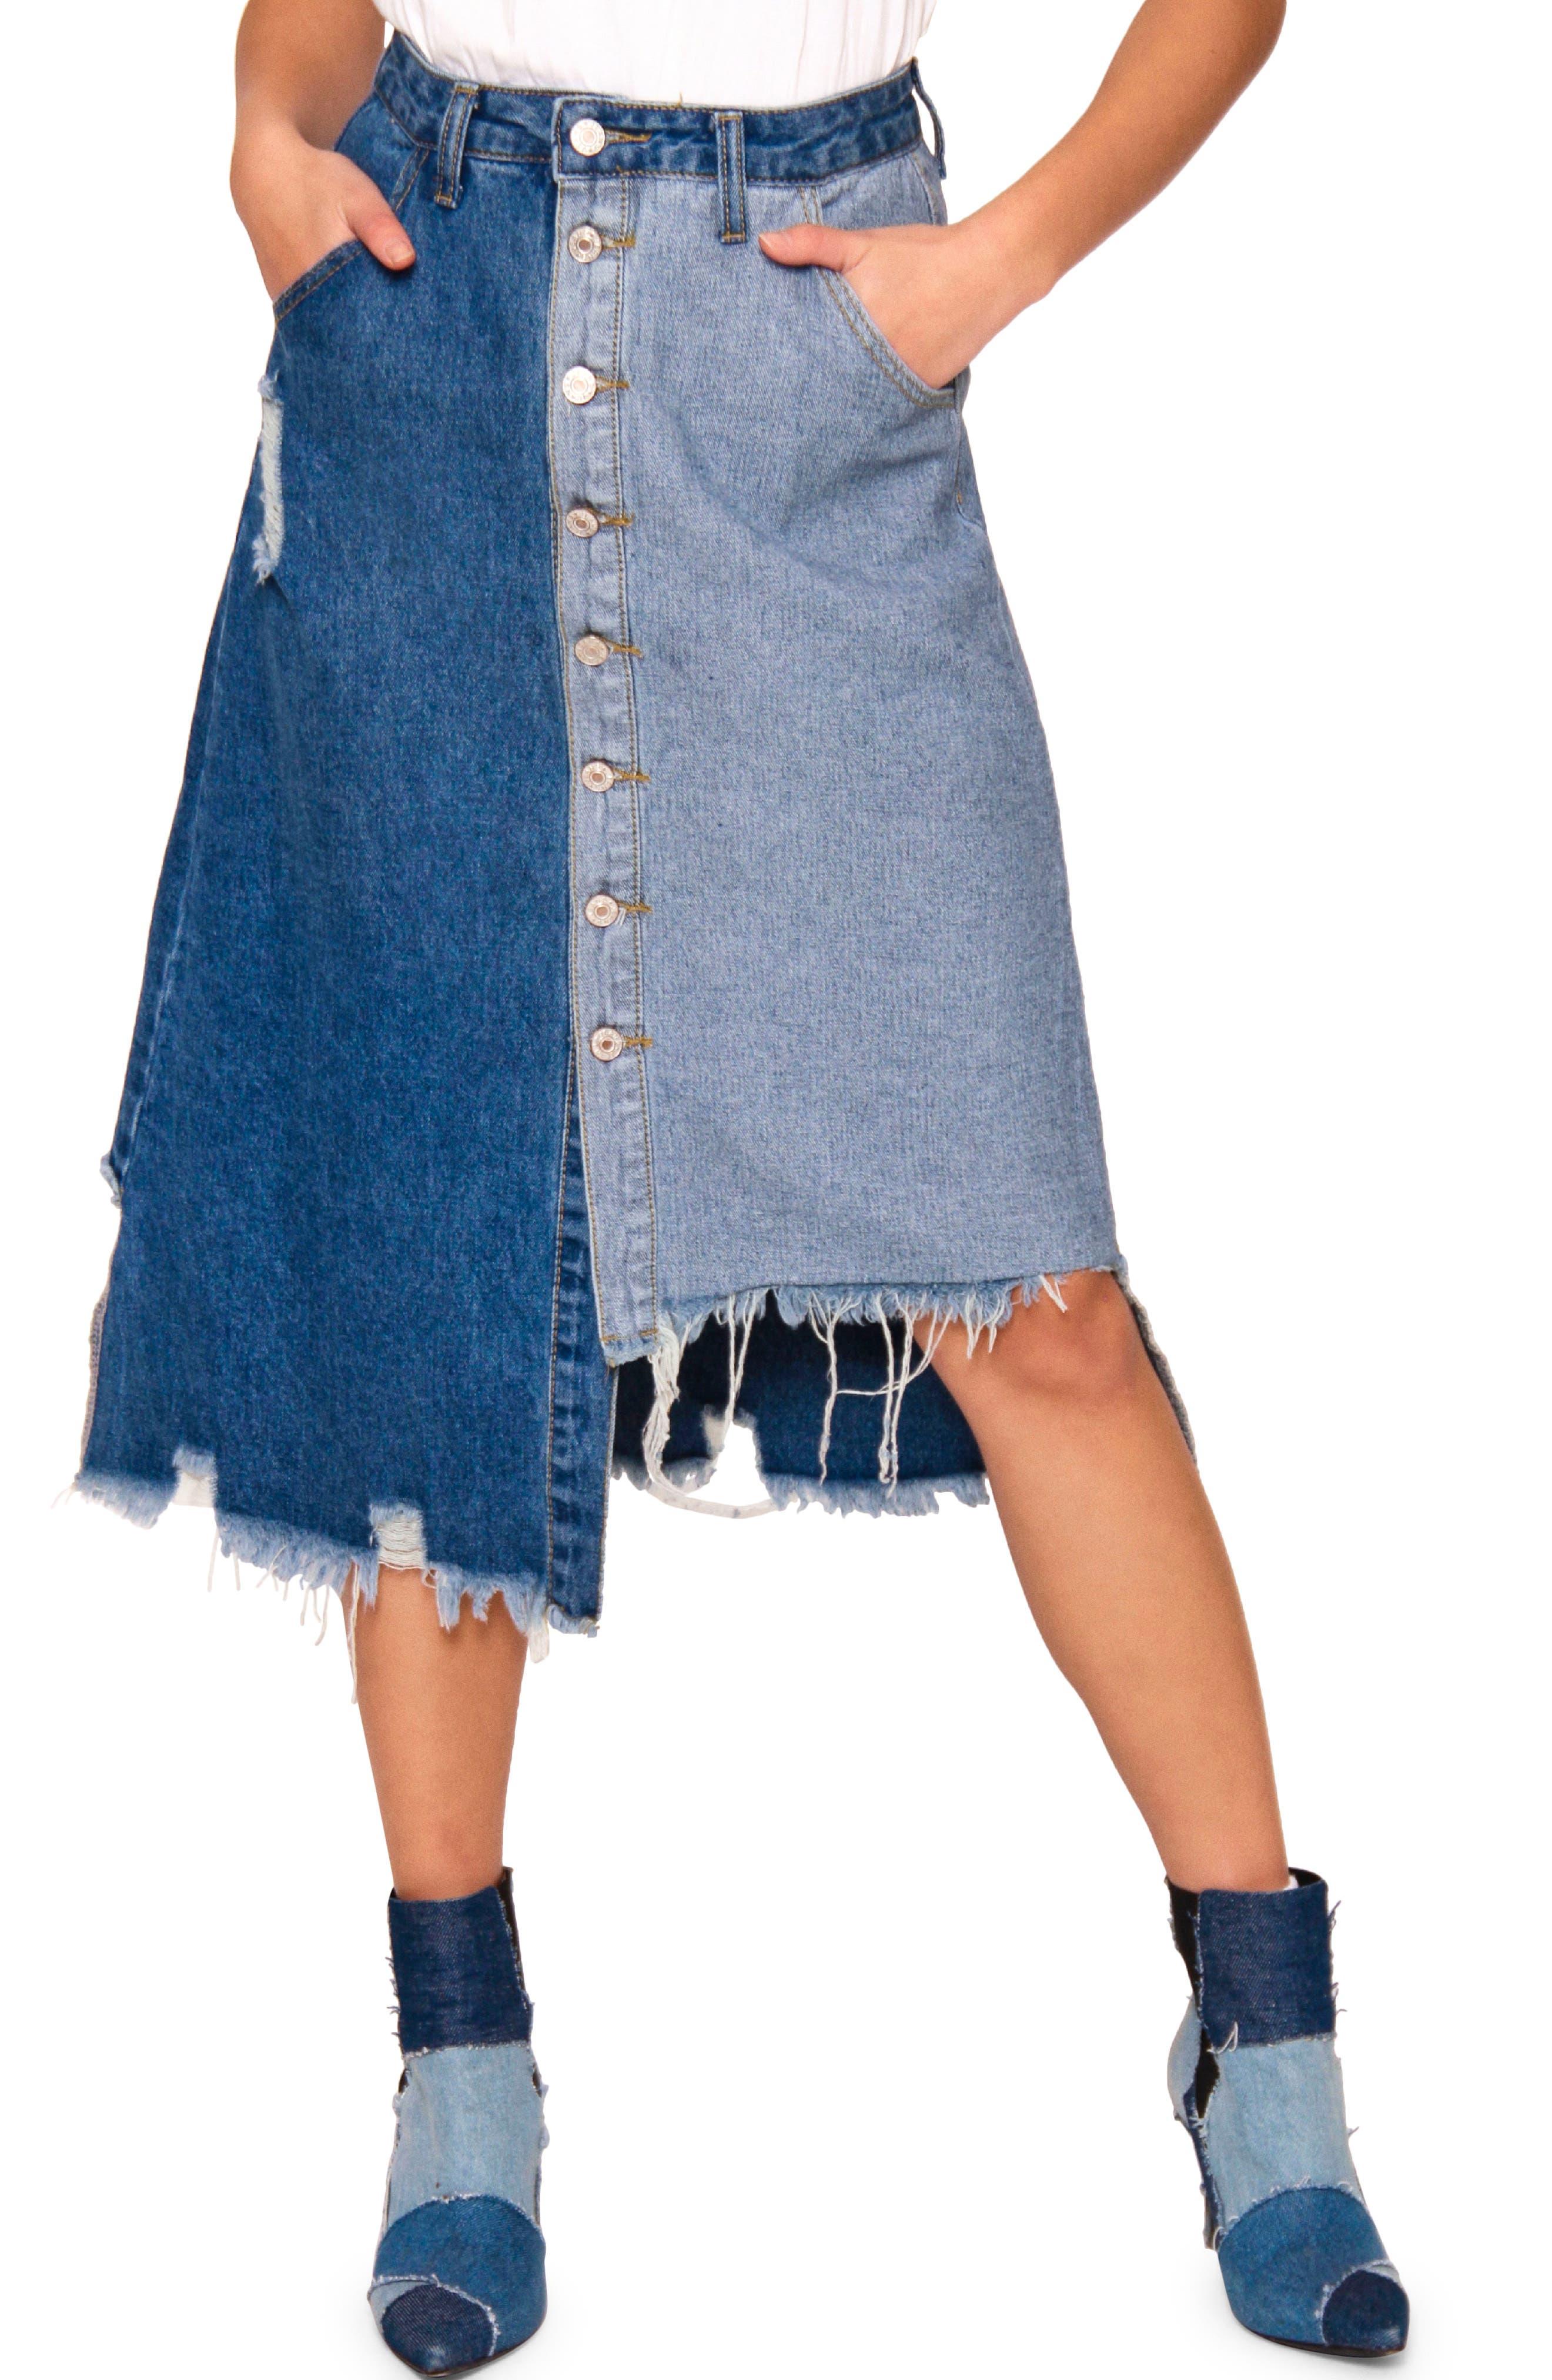 Adda Pieced Denim Skirt